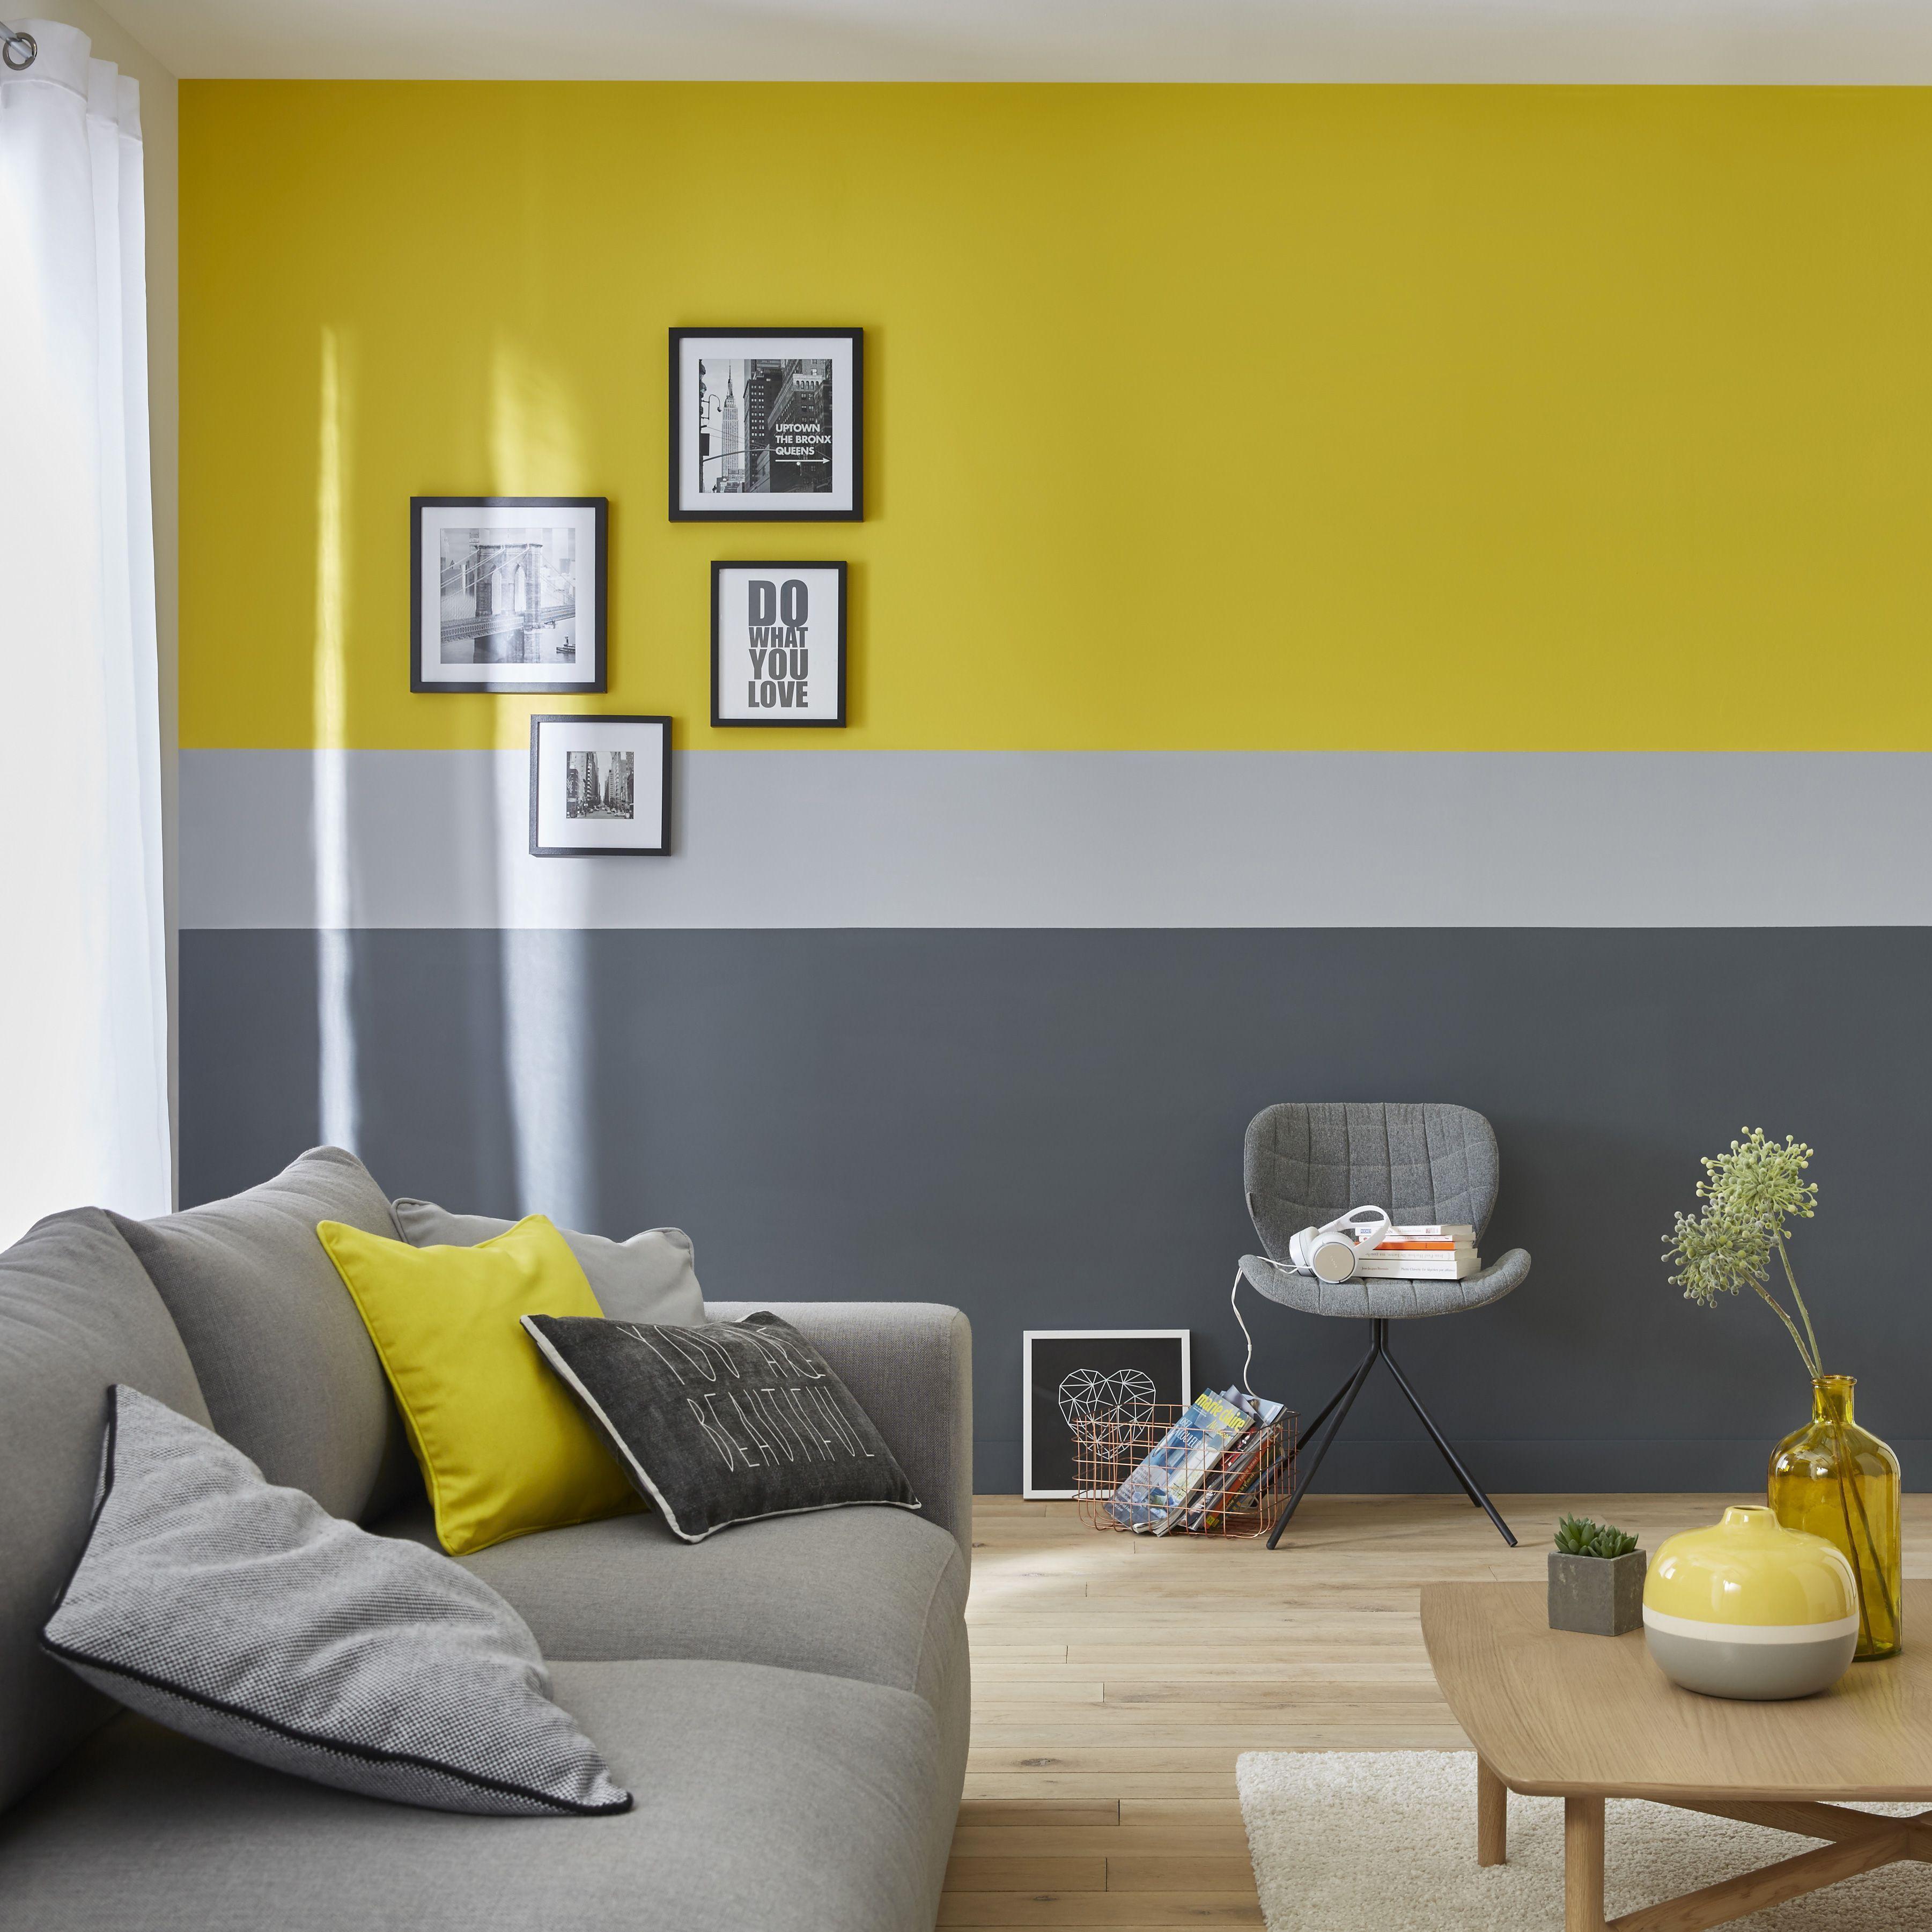 Geometric Accent Wall Trend 45 Inspiring Wall Mural Designs That Will Beautify Your Home Wallmur Oturma Odasi Fikirleri Tasarim Ic Mekanlar Ev Ic Mekanlari